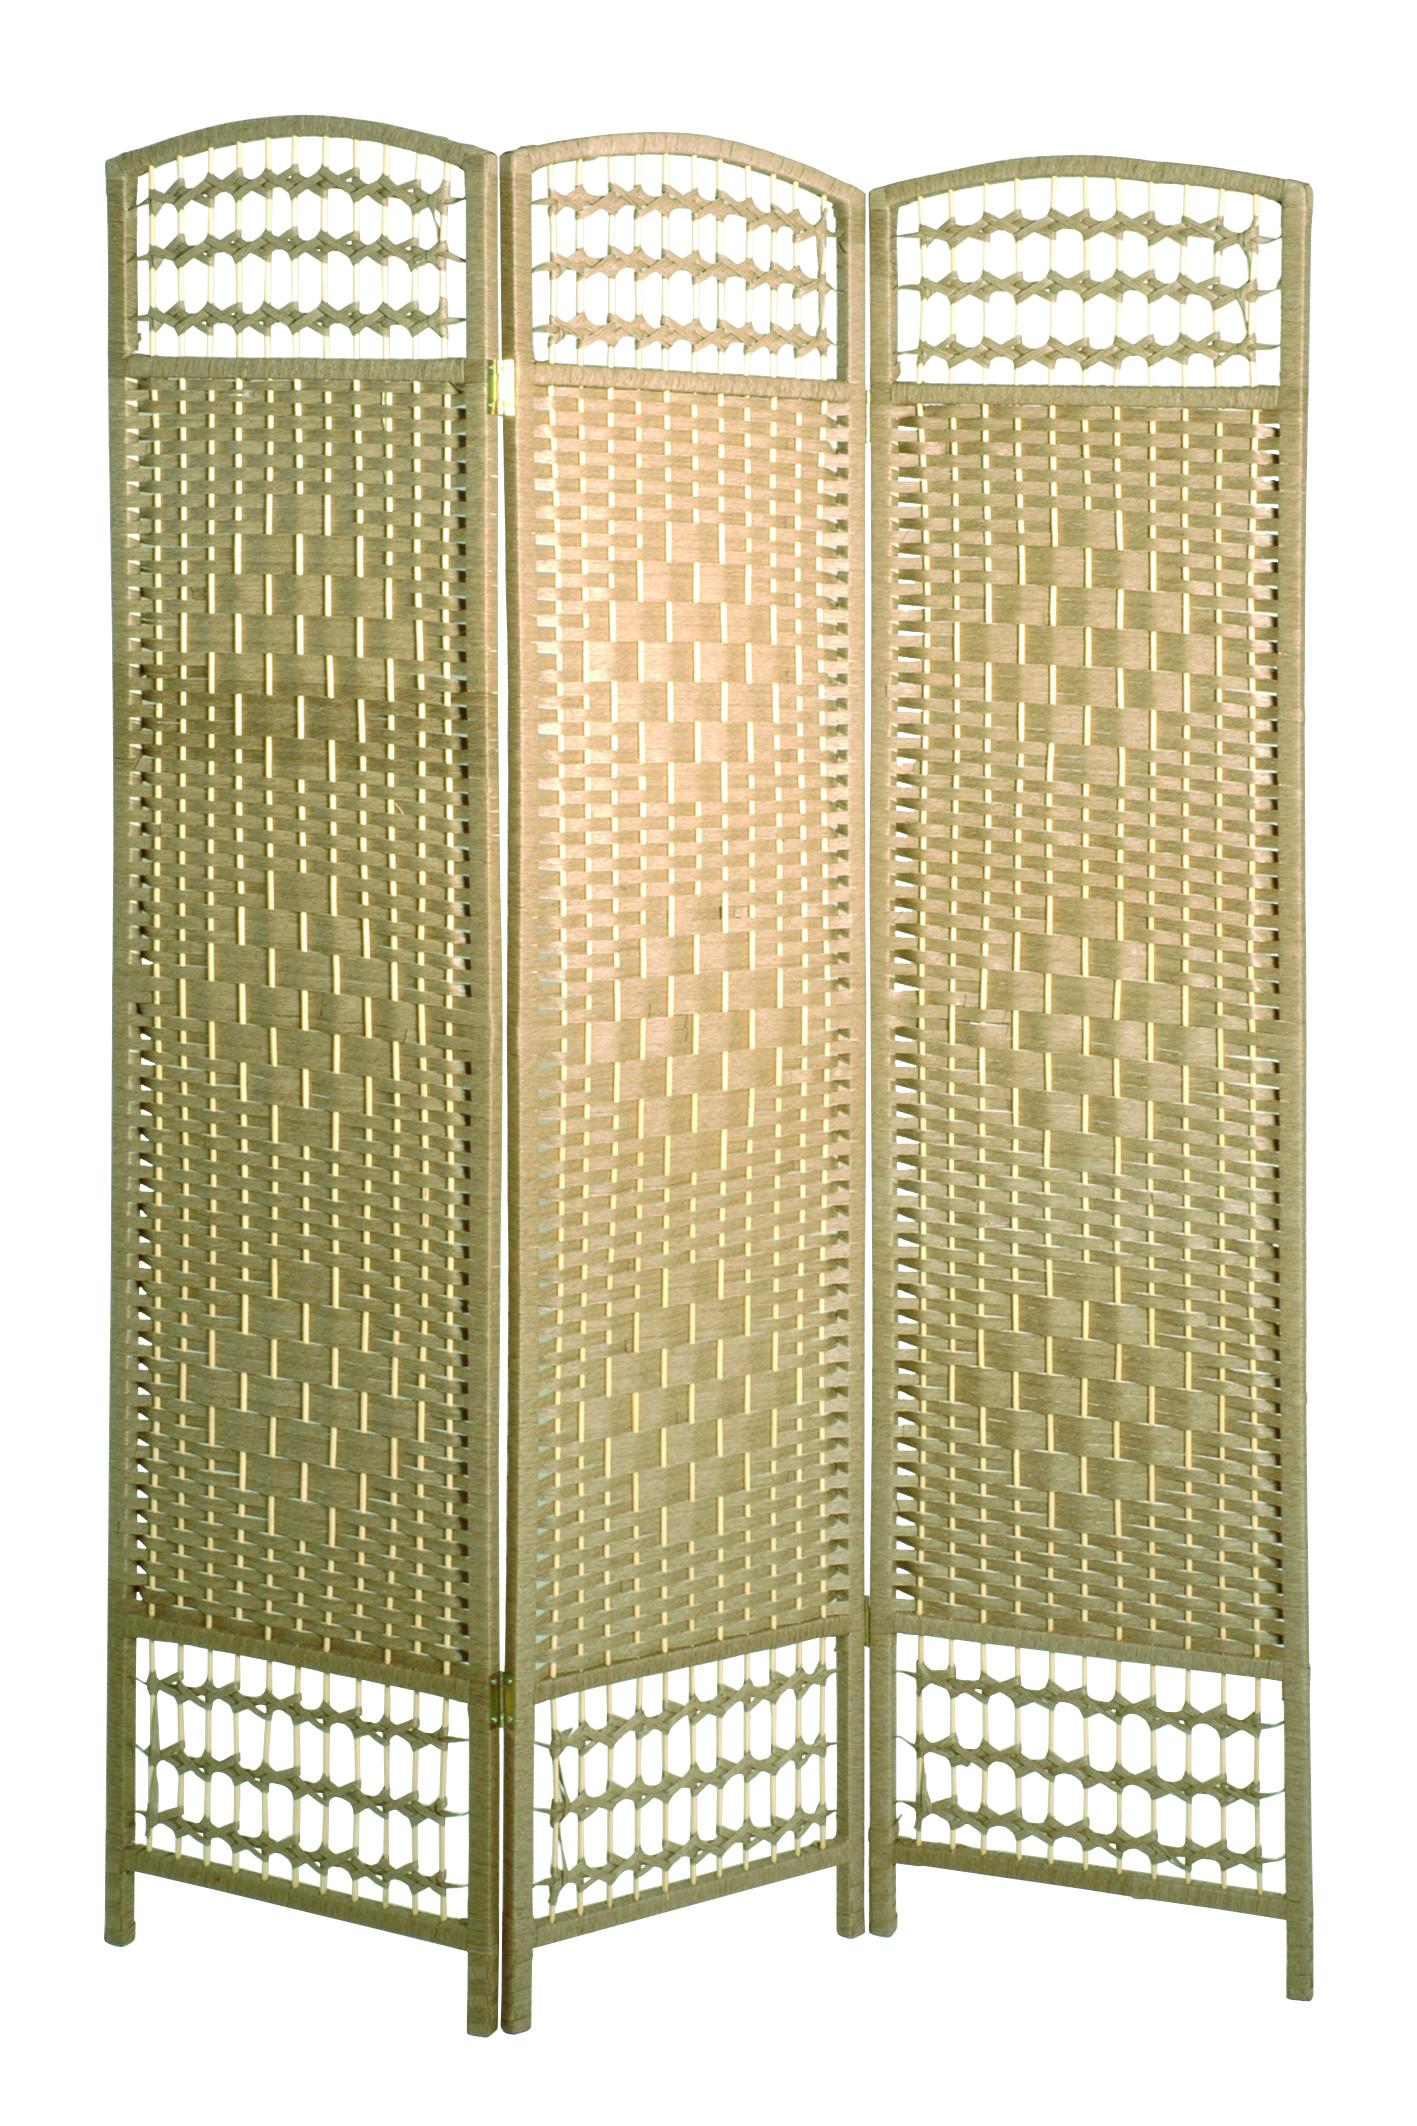 3 Flügel Paravent Bettina - Naturfarben, MODERN, Holz (120/170/2cm)